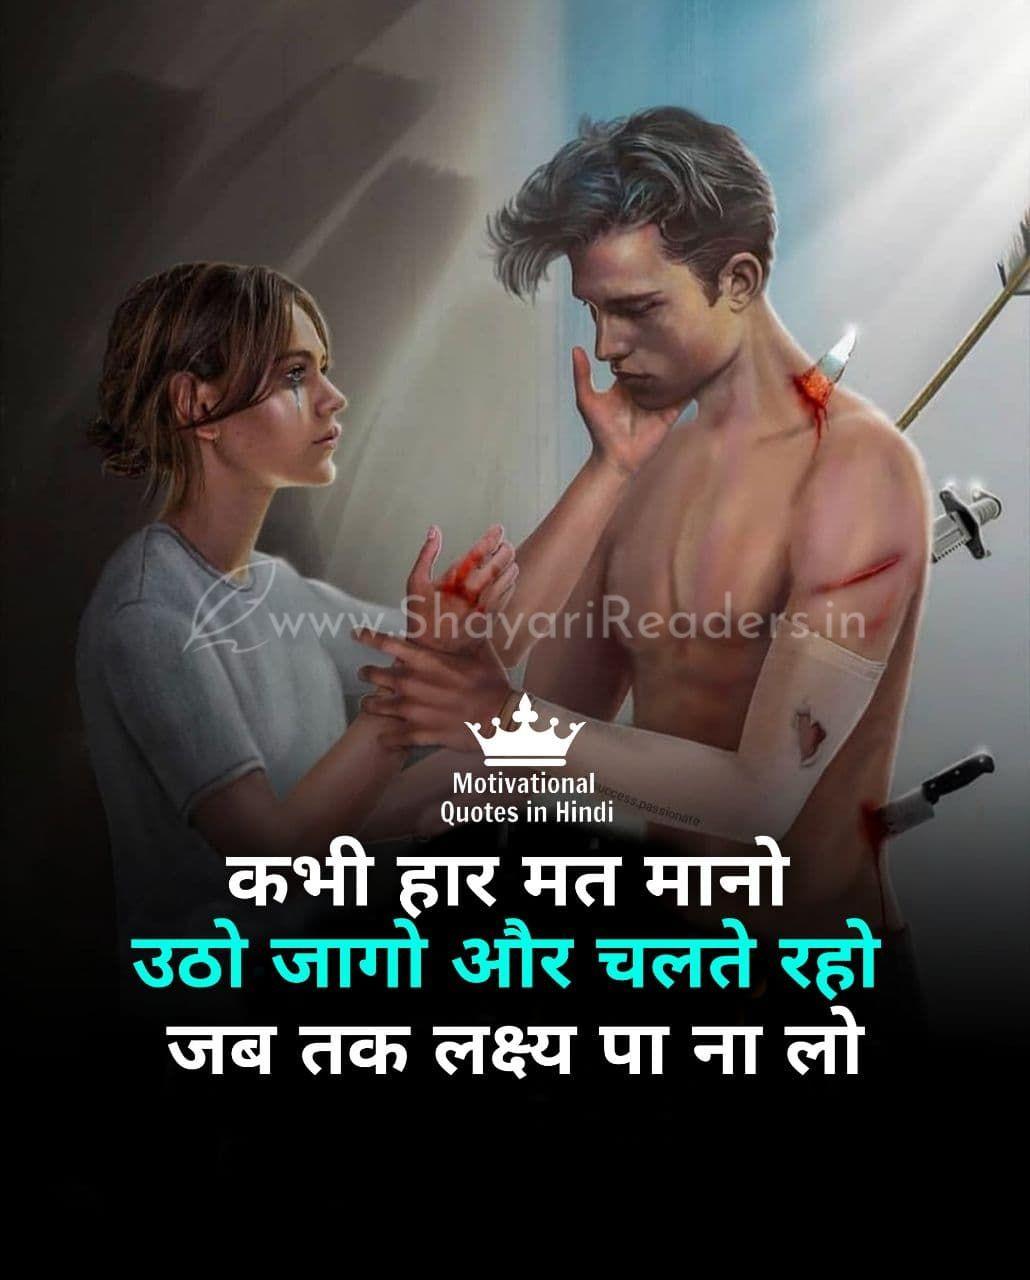 Motivational Quotes in Hindi - मोटिवेशनल कोट्स हिंदी मैं